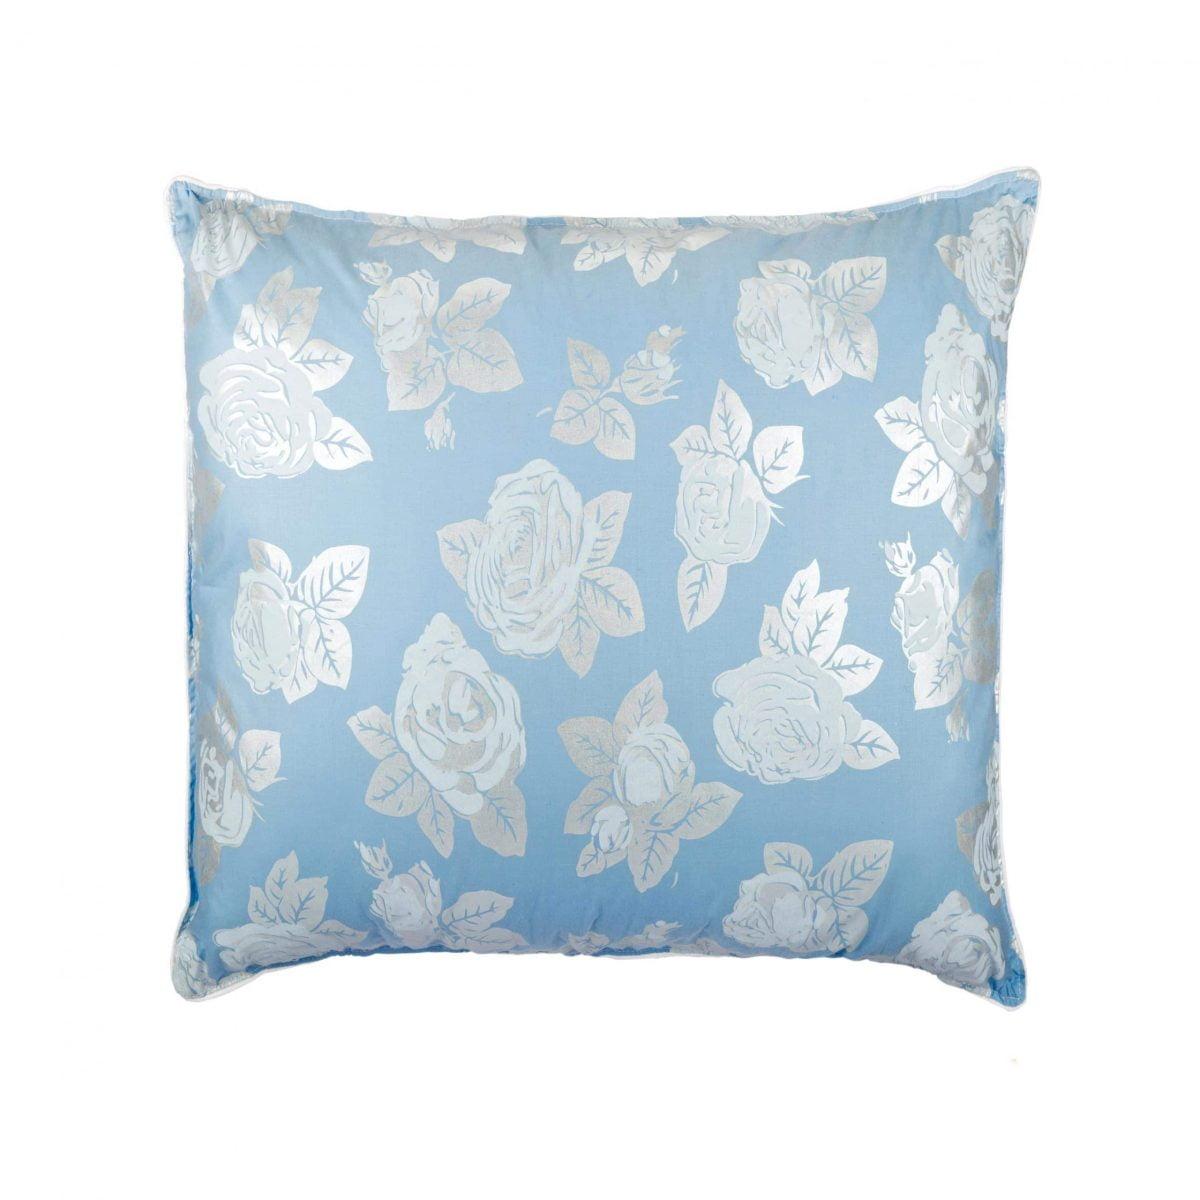 Perna SOMNART, 60×60 cm, umplutura pene 90%, puf 10%, bumbac 100%, model floral blue